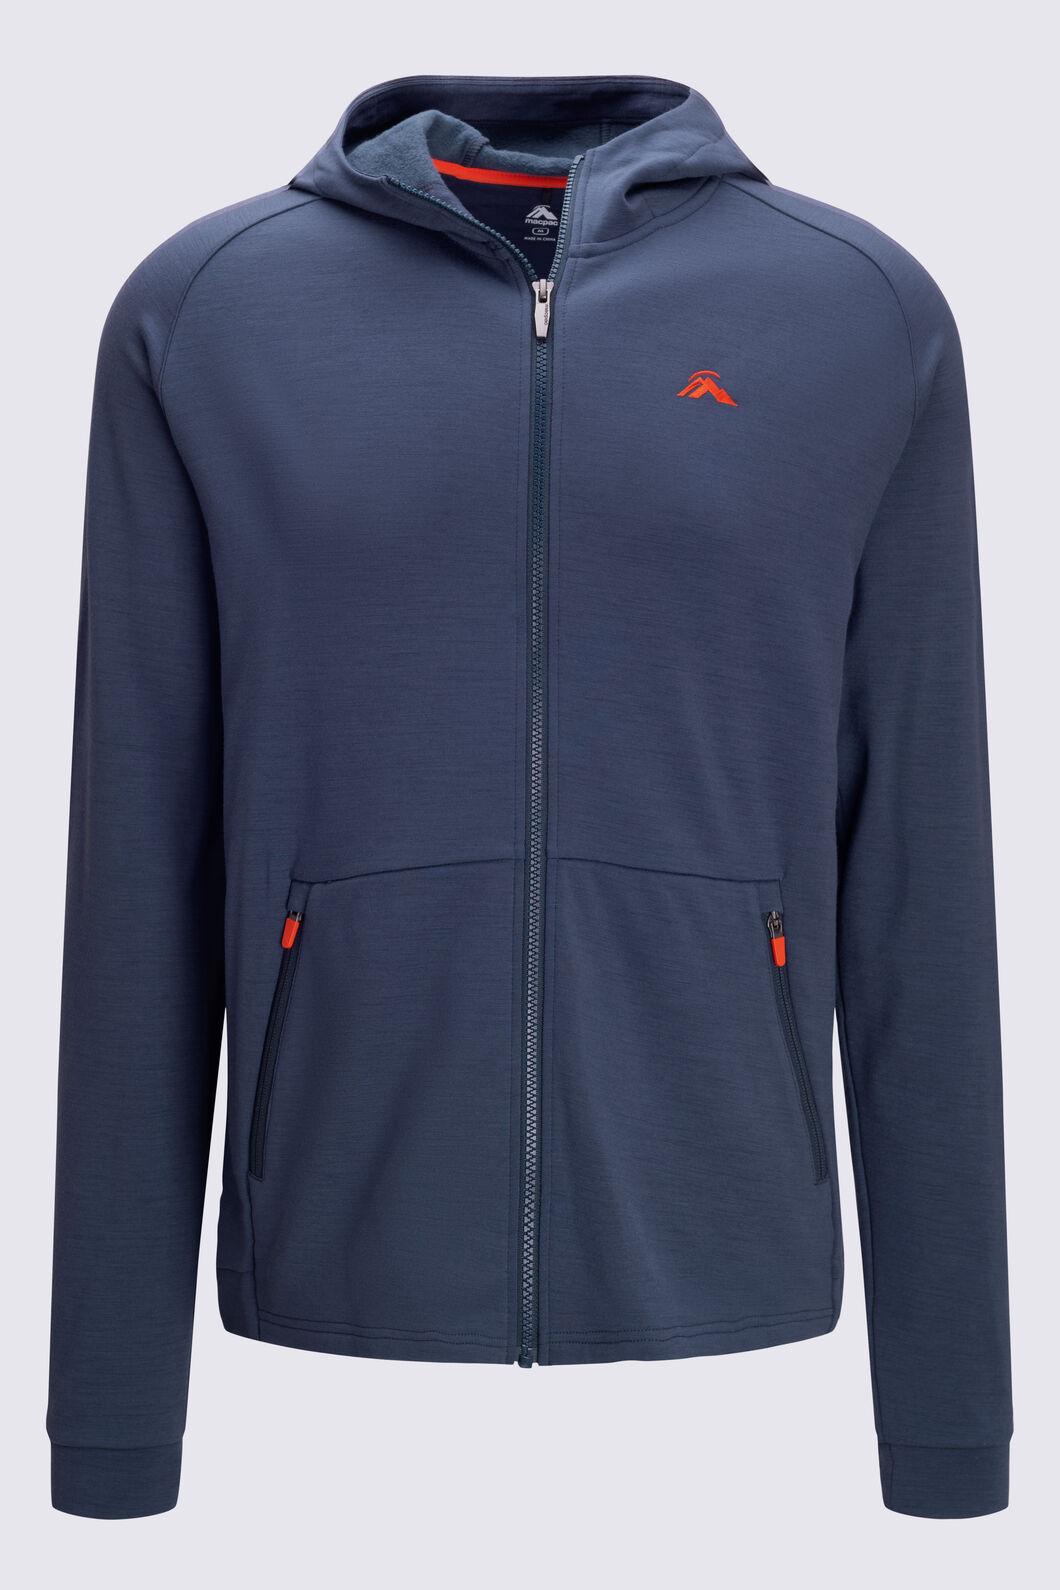 Macpac Men's Craigieburn 280 Merino Blend Hooded Jacket, BLUE NIGHTS, hi-res